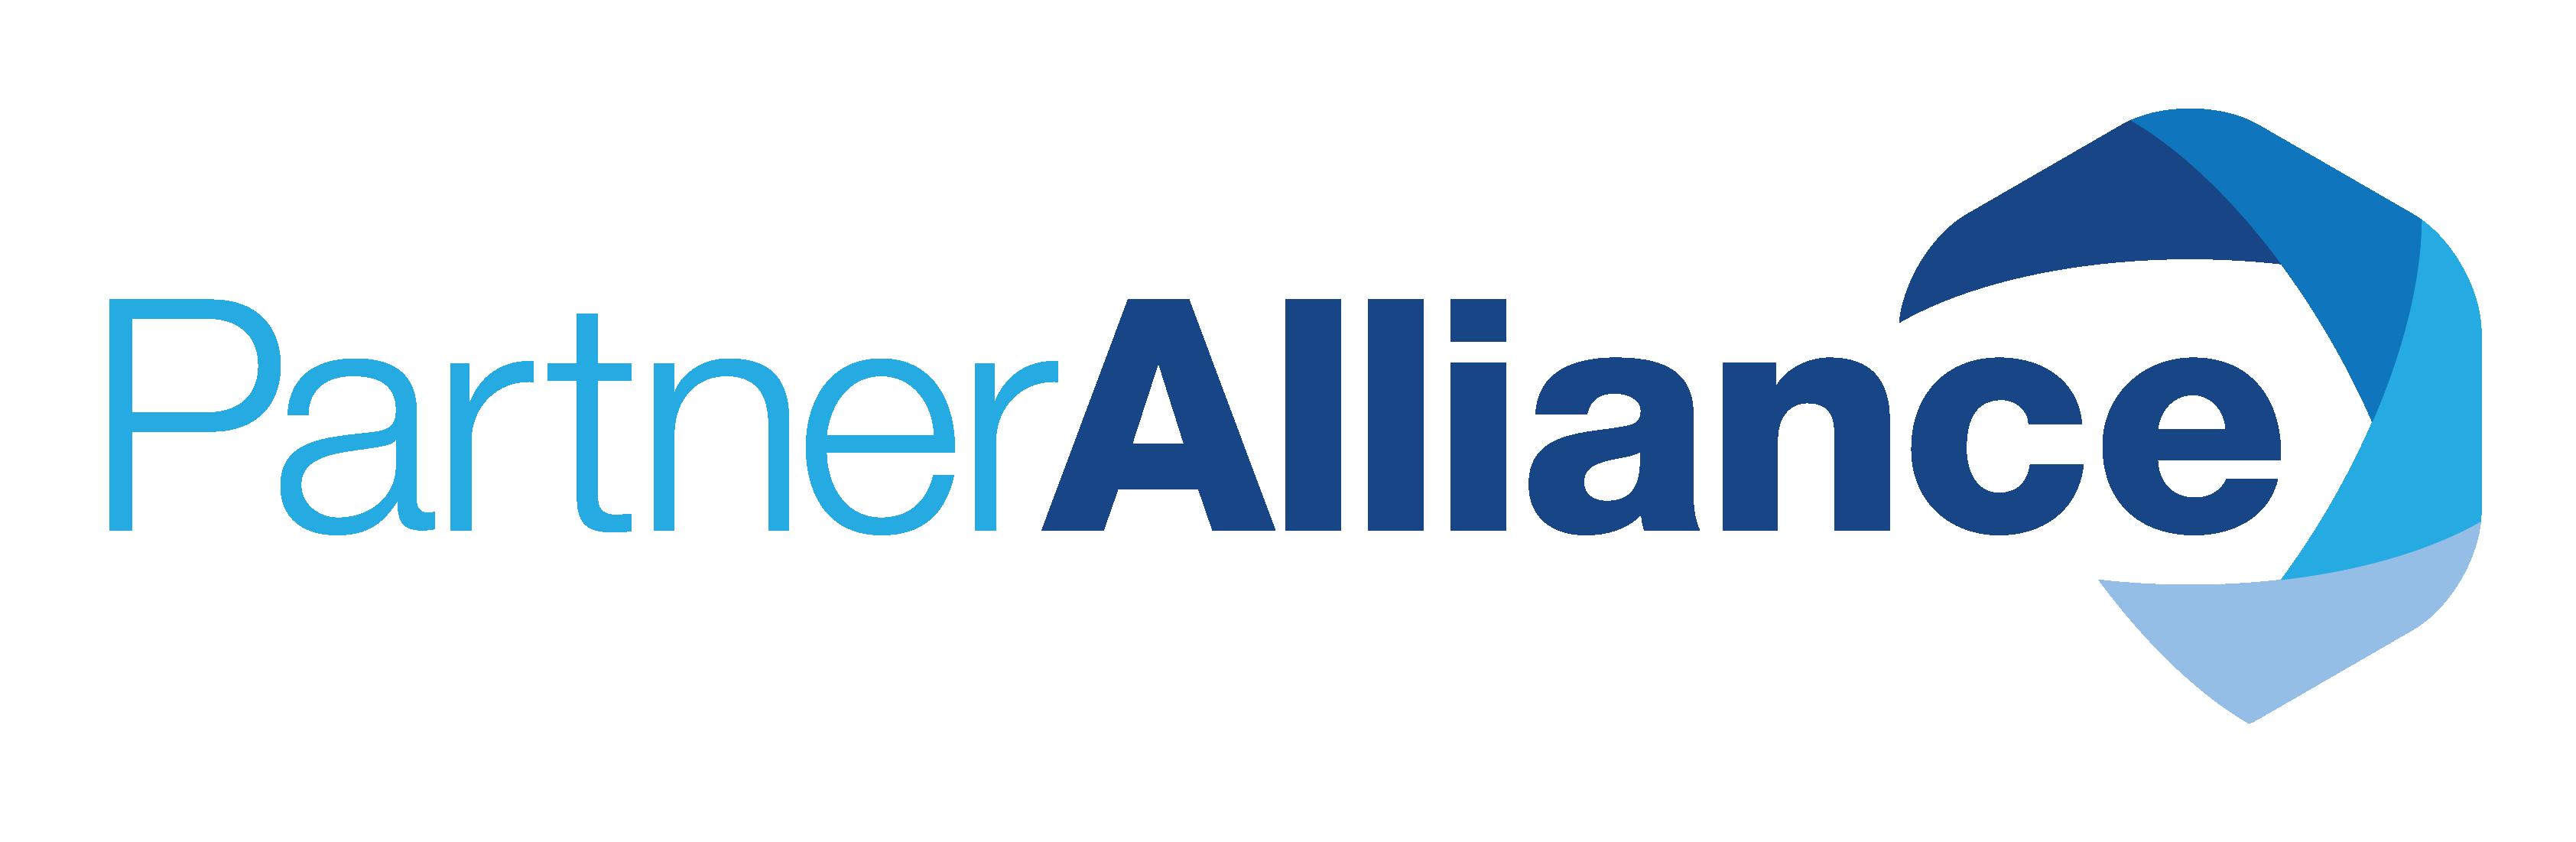 PartnerAlliance Logo